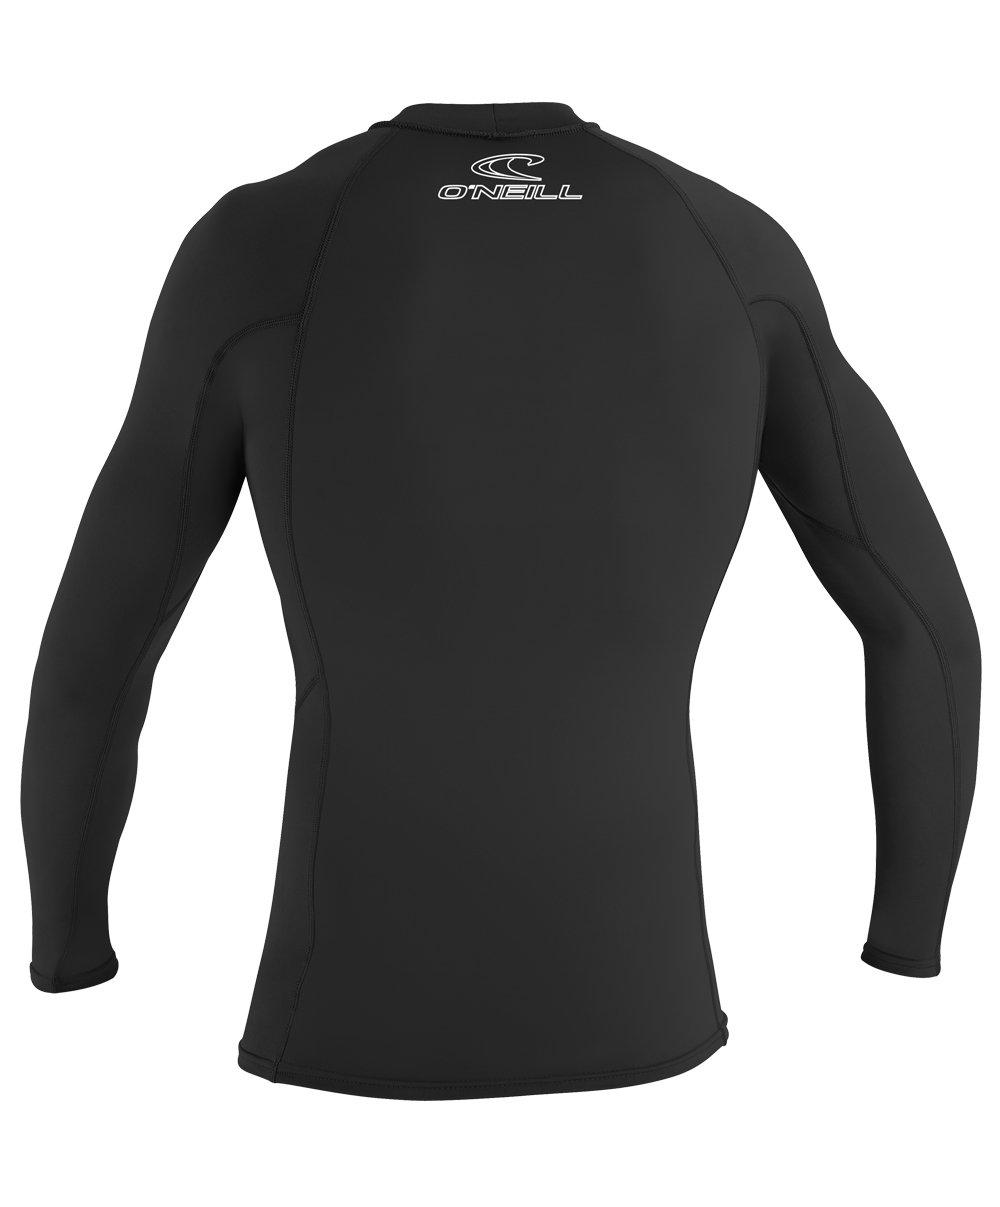 Amazon.com: O'Neill Wetsuits UV Sun Protection Mens Basic Skins ...